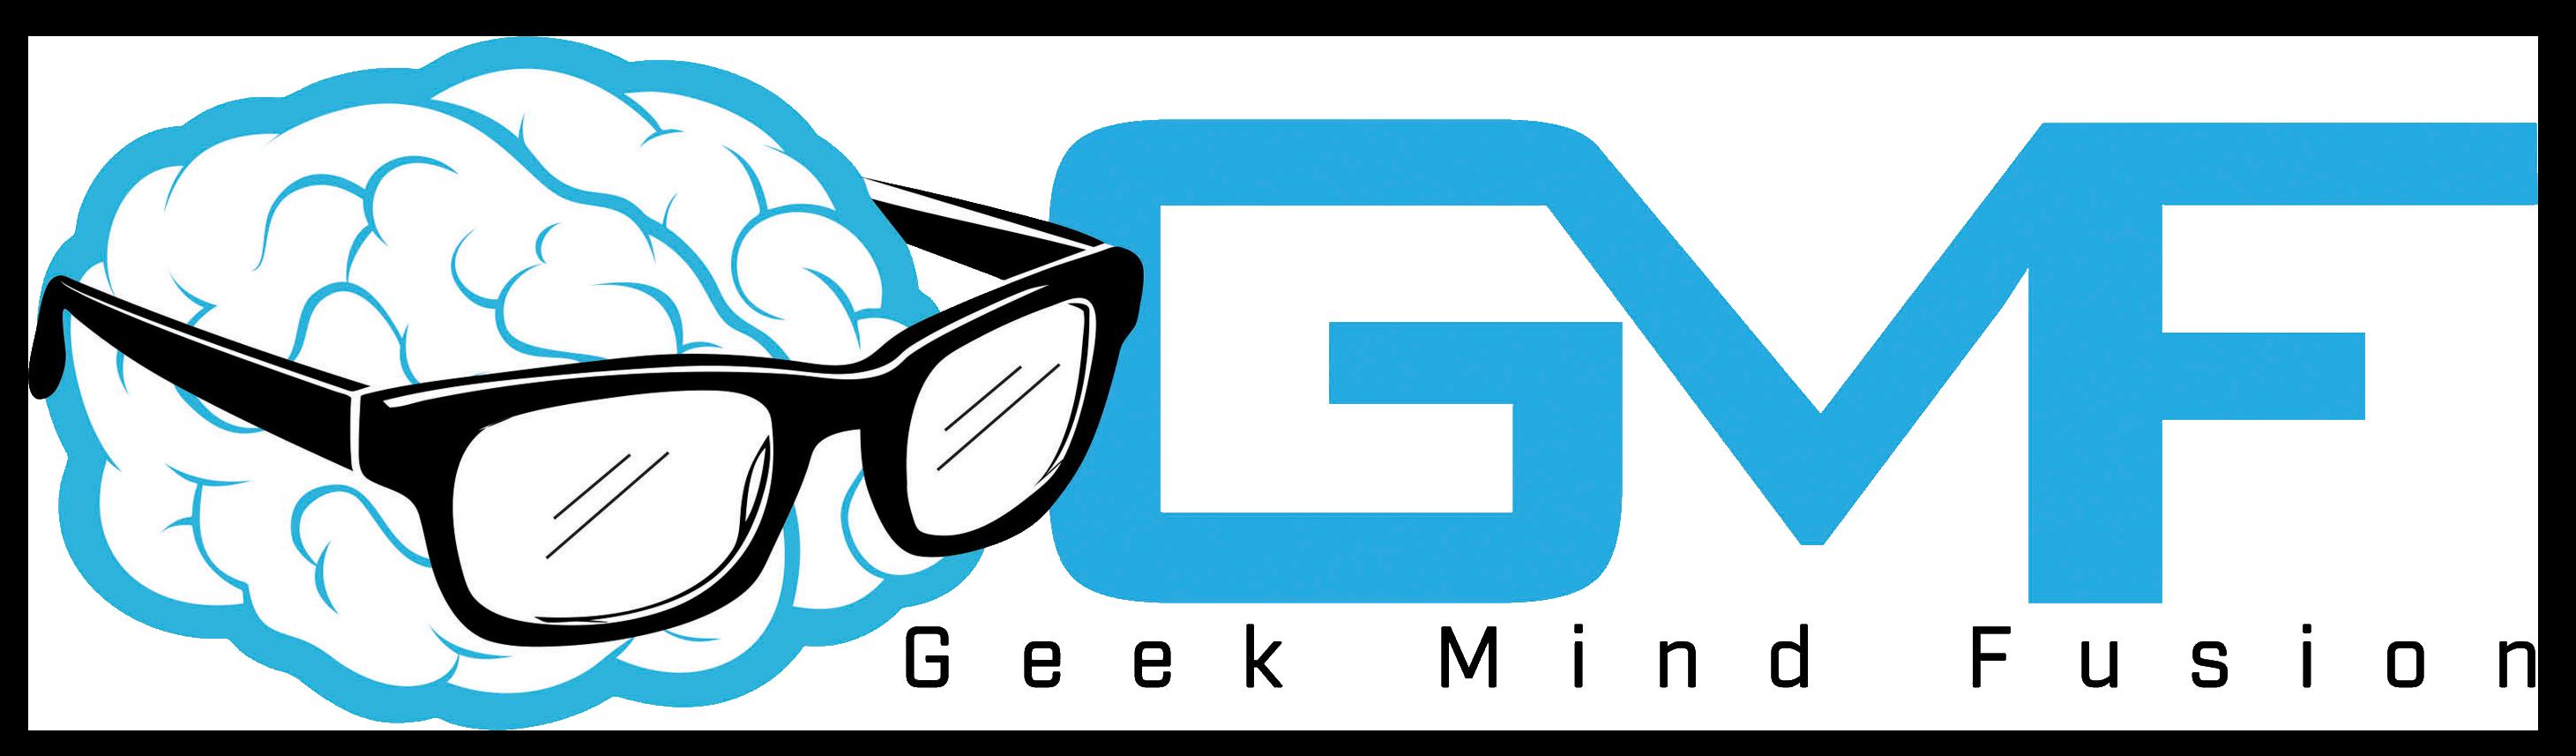 Geek Mind Fusion